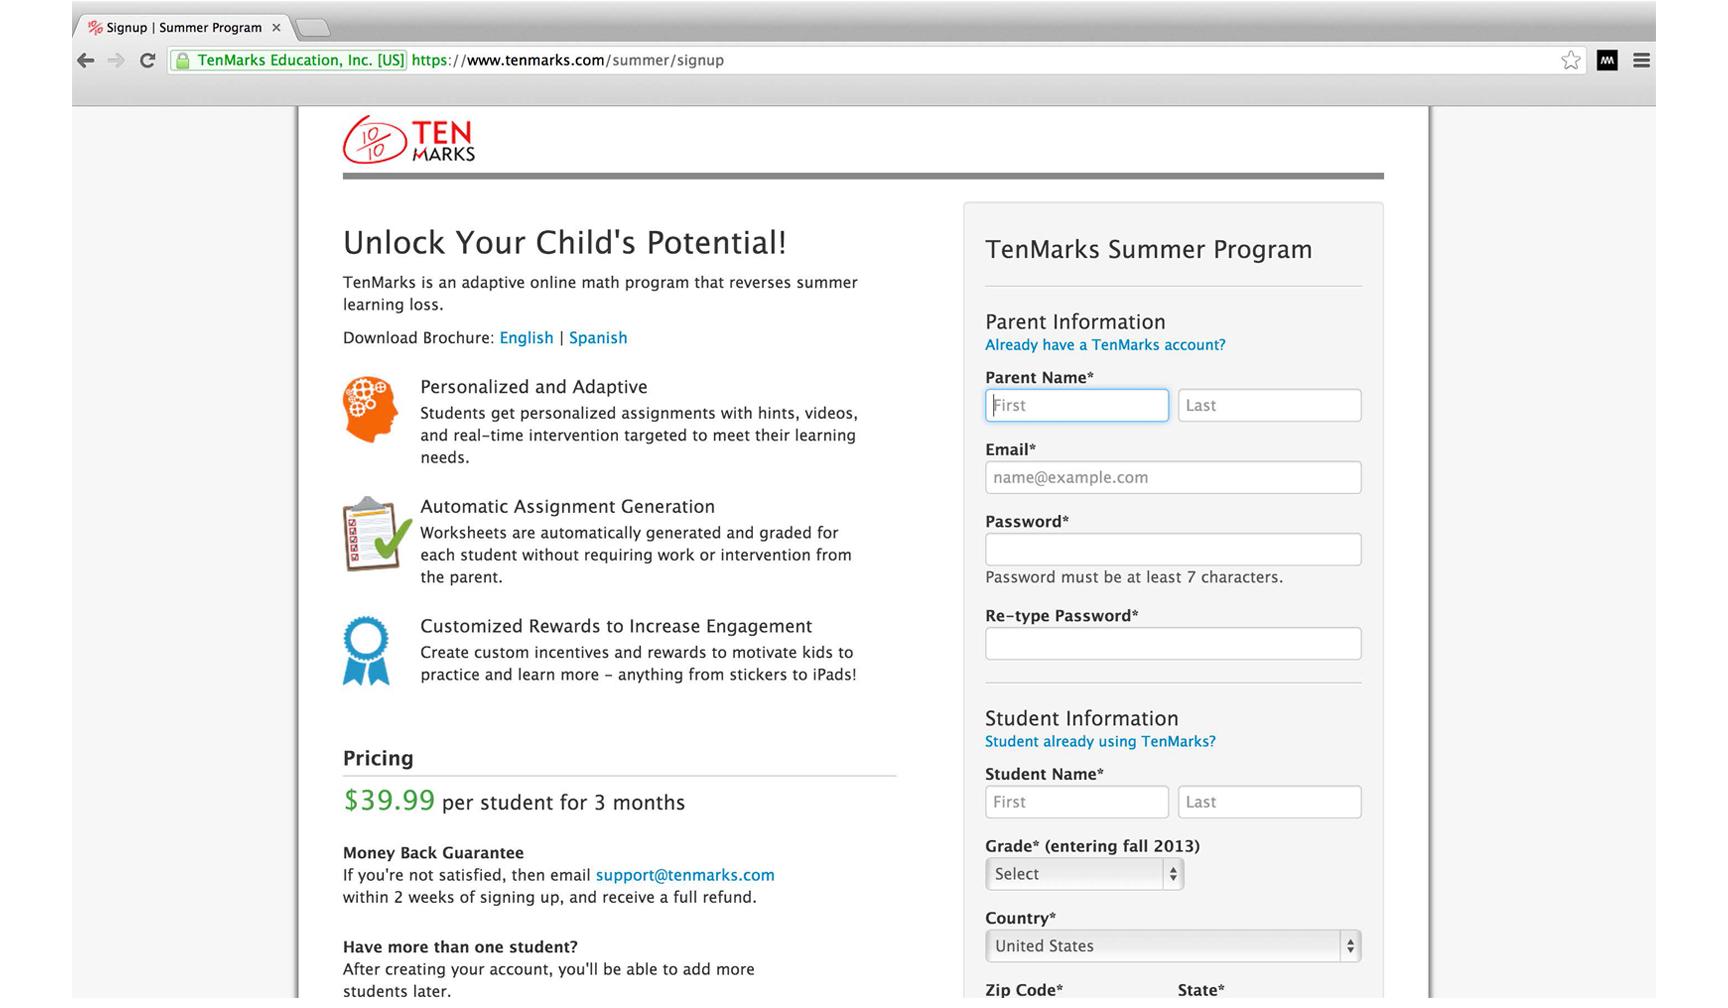 tenmarks_website_4.jpg